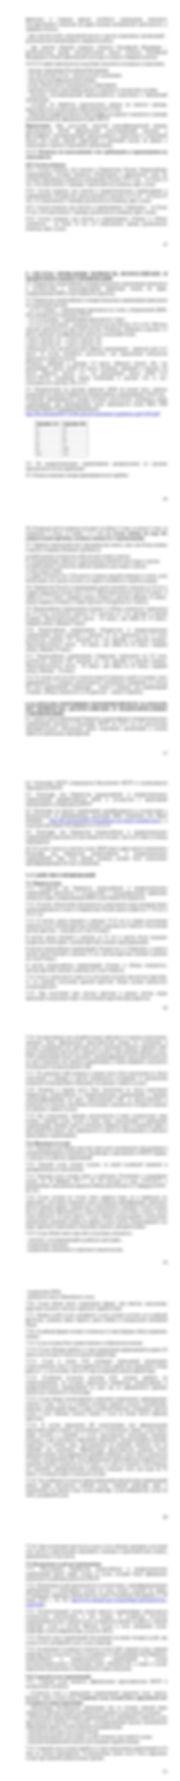 регламент 15.21.jpg